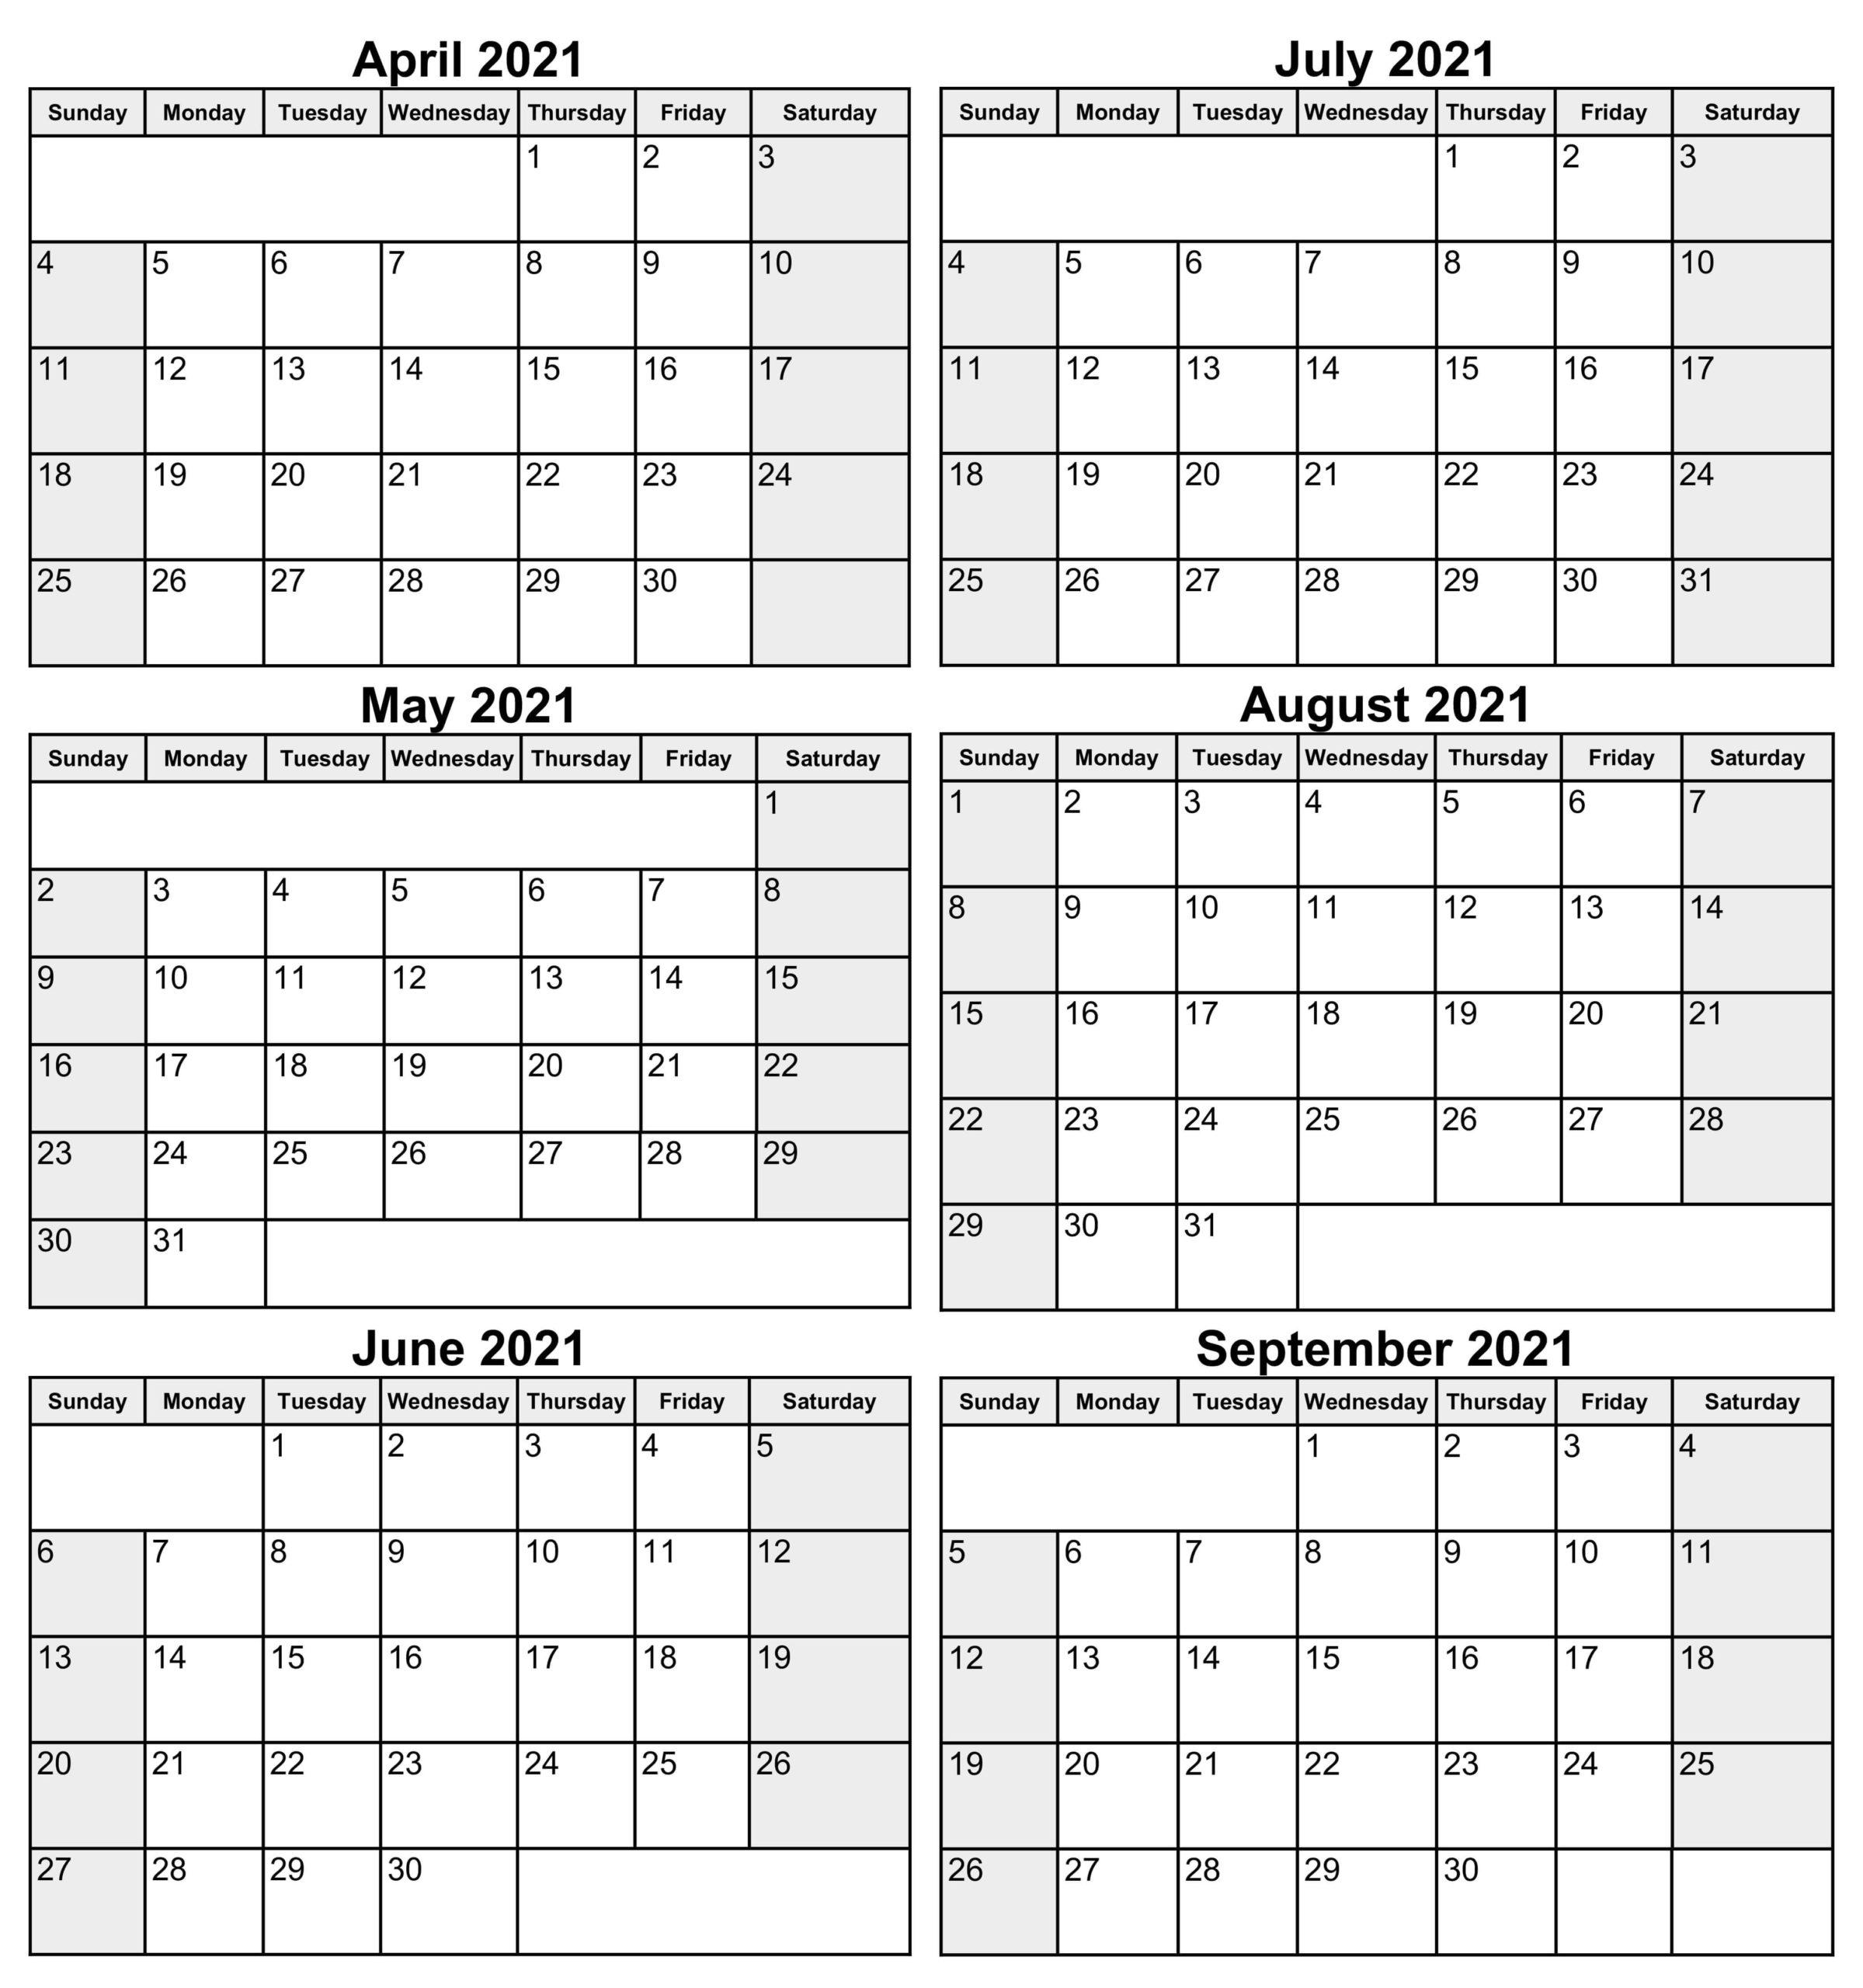 6 Month Calendar From April 2021